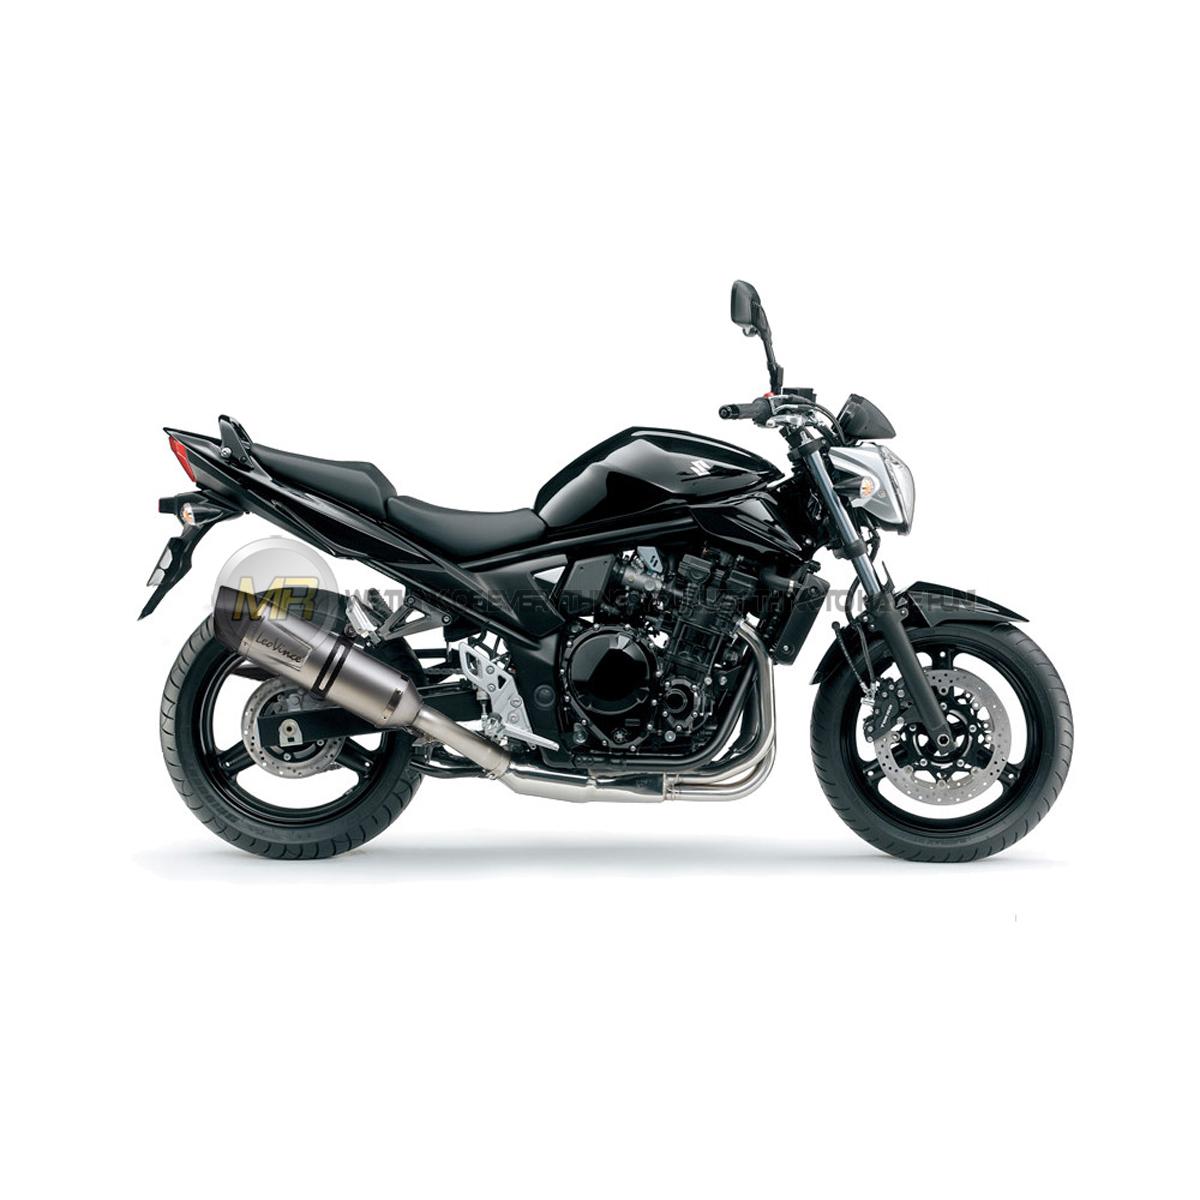 Suzuki Gsf 650 Bandit 2007 To 2015 Exhaust Slip On Silencer Leovince Lv One E Ebay